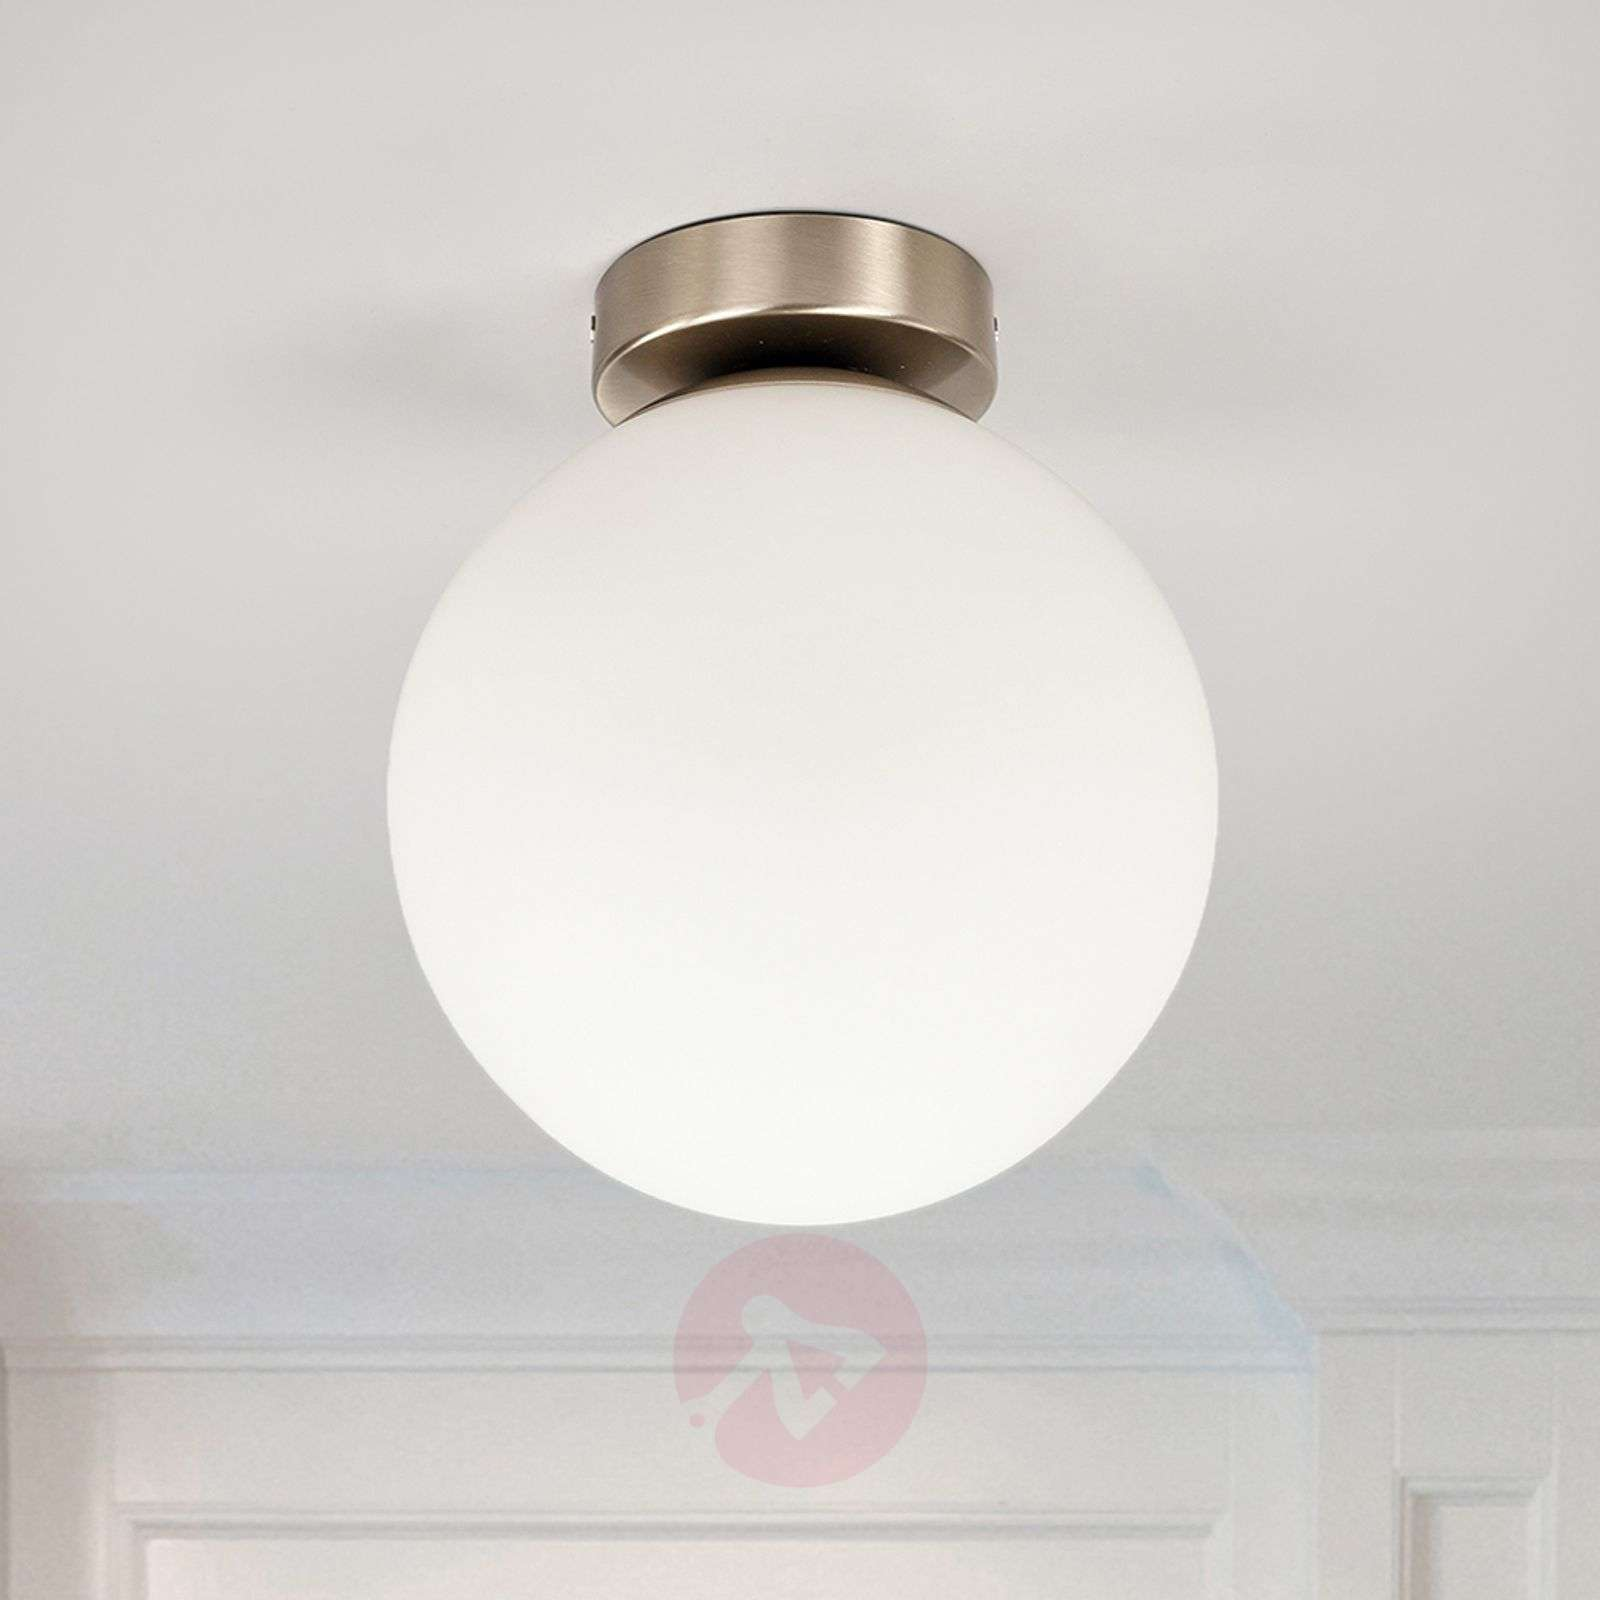 Round bathroom ceiling light Lennie | Lights.ie